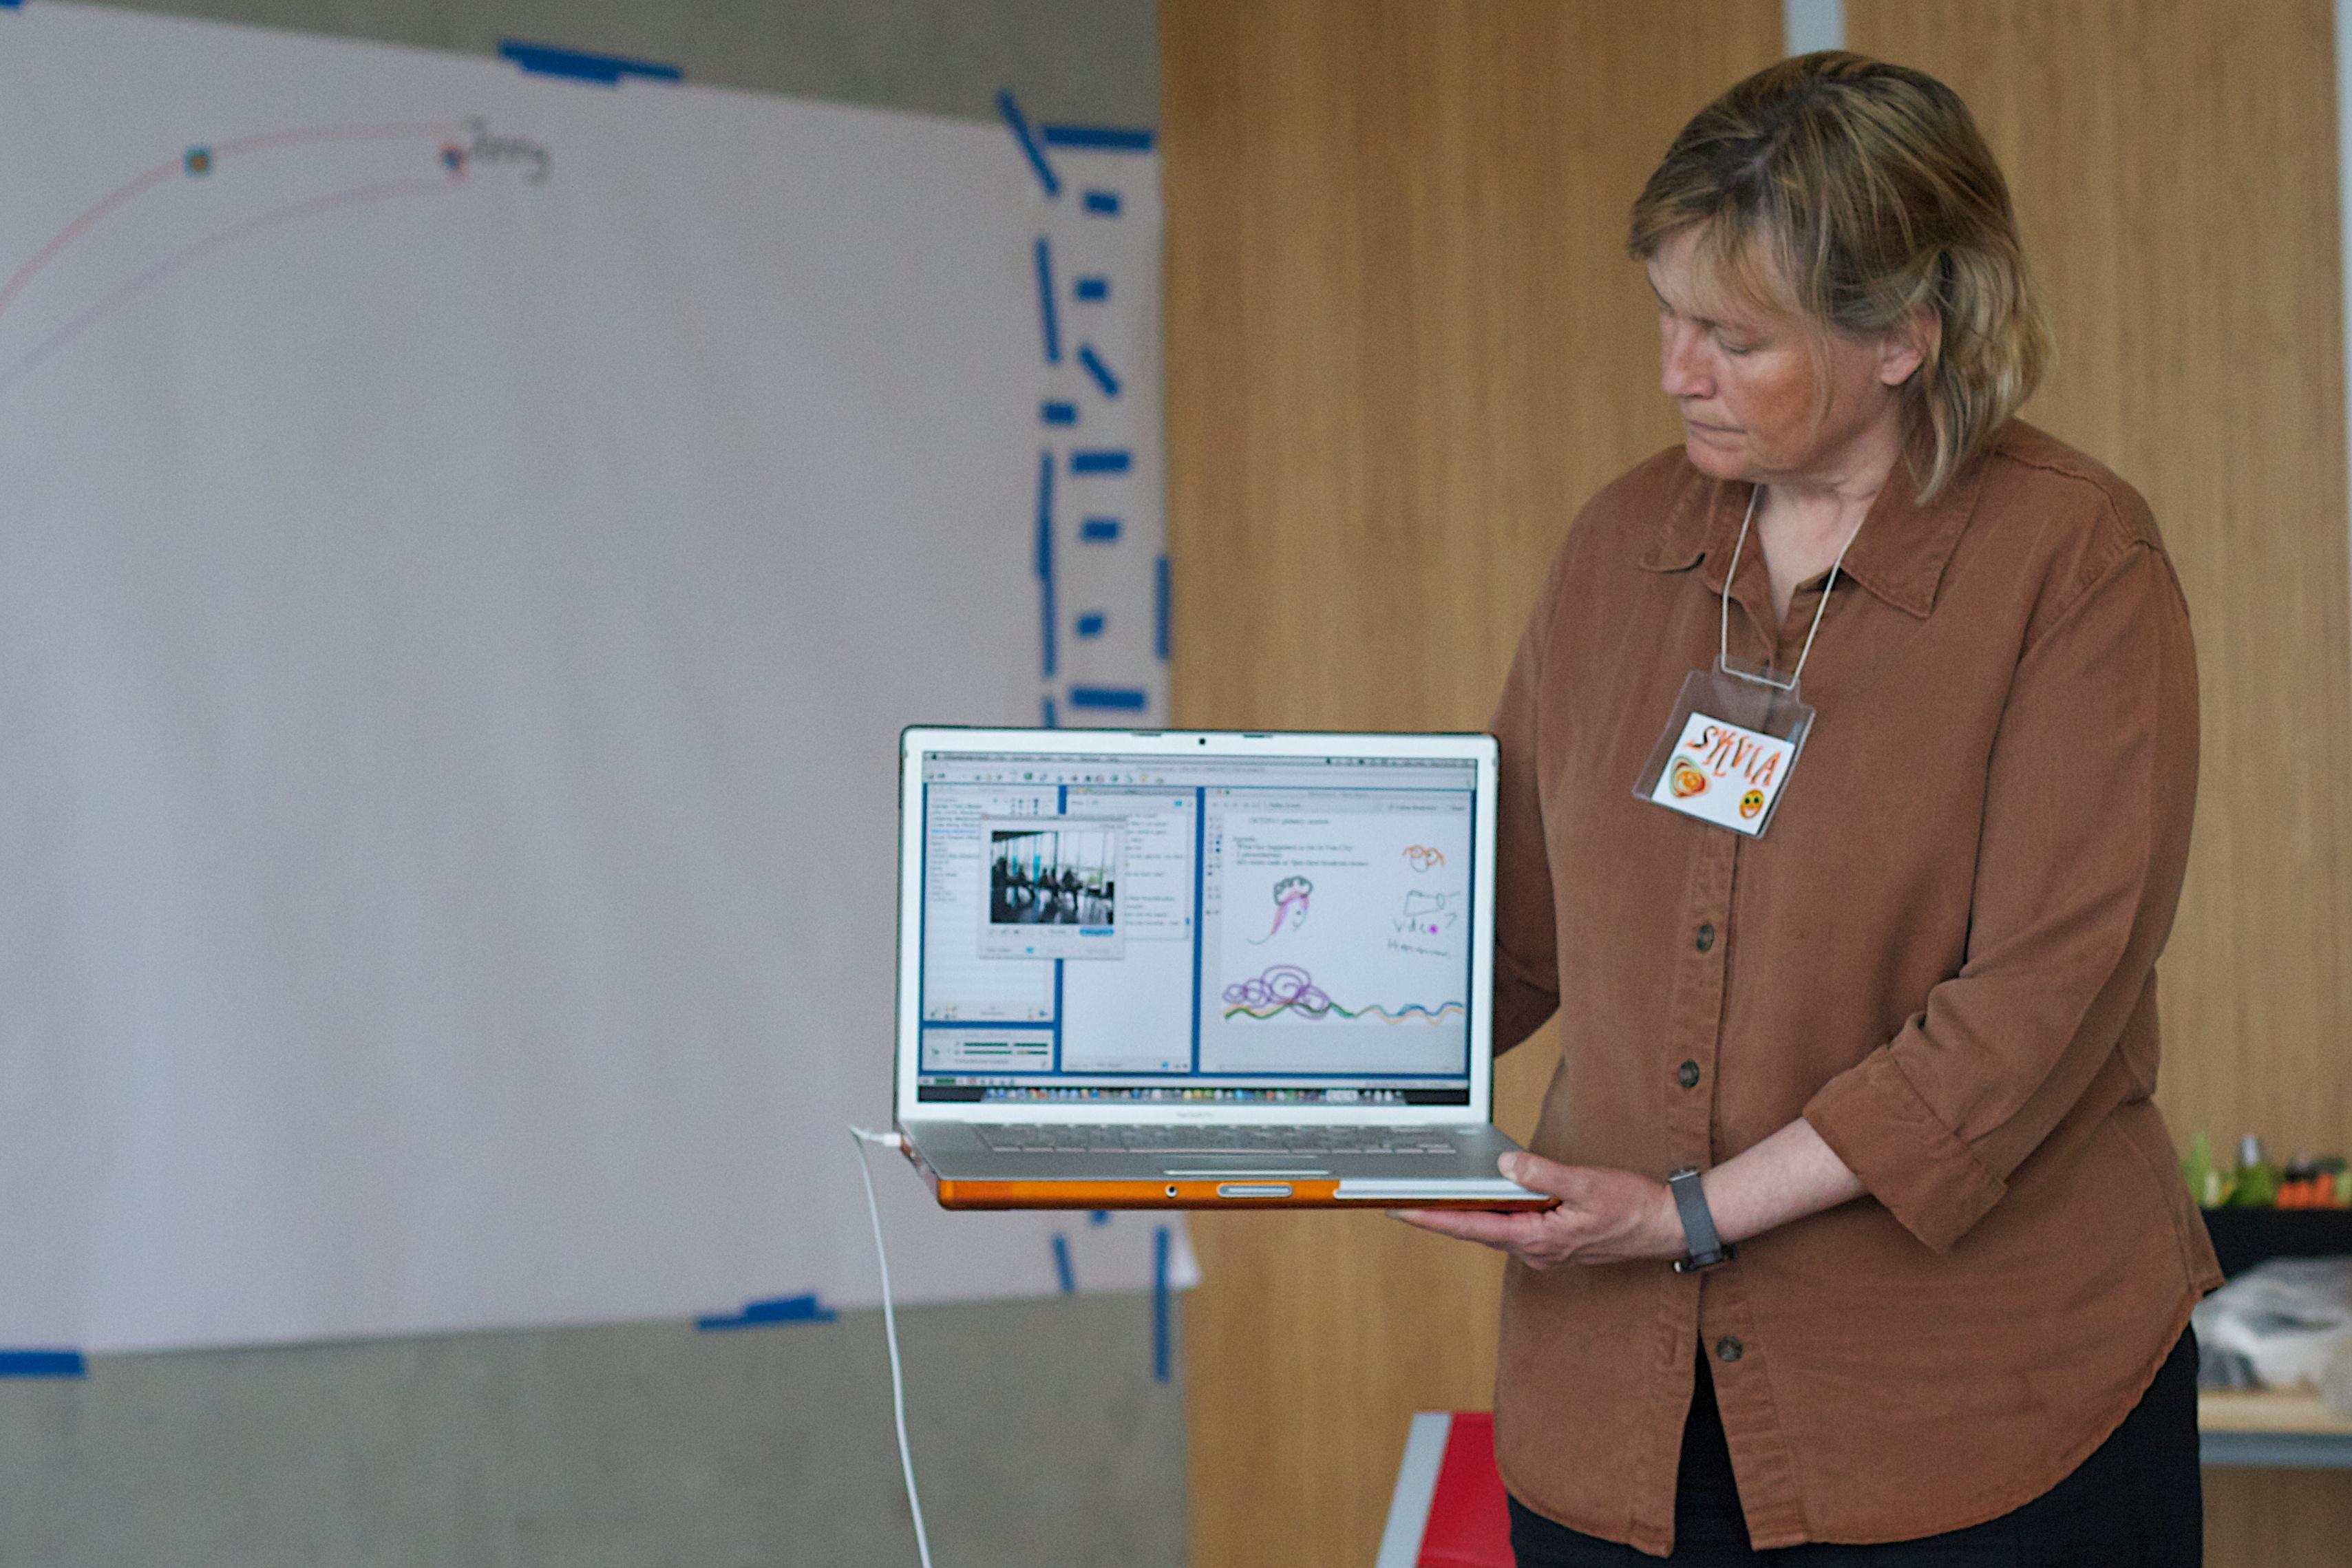 free images technology communication professional profession